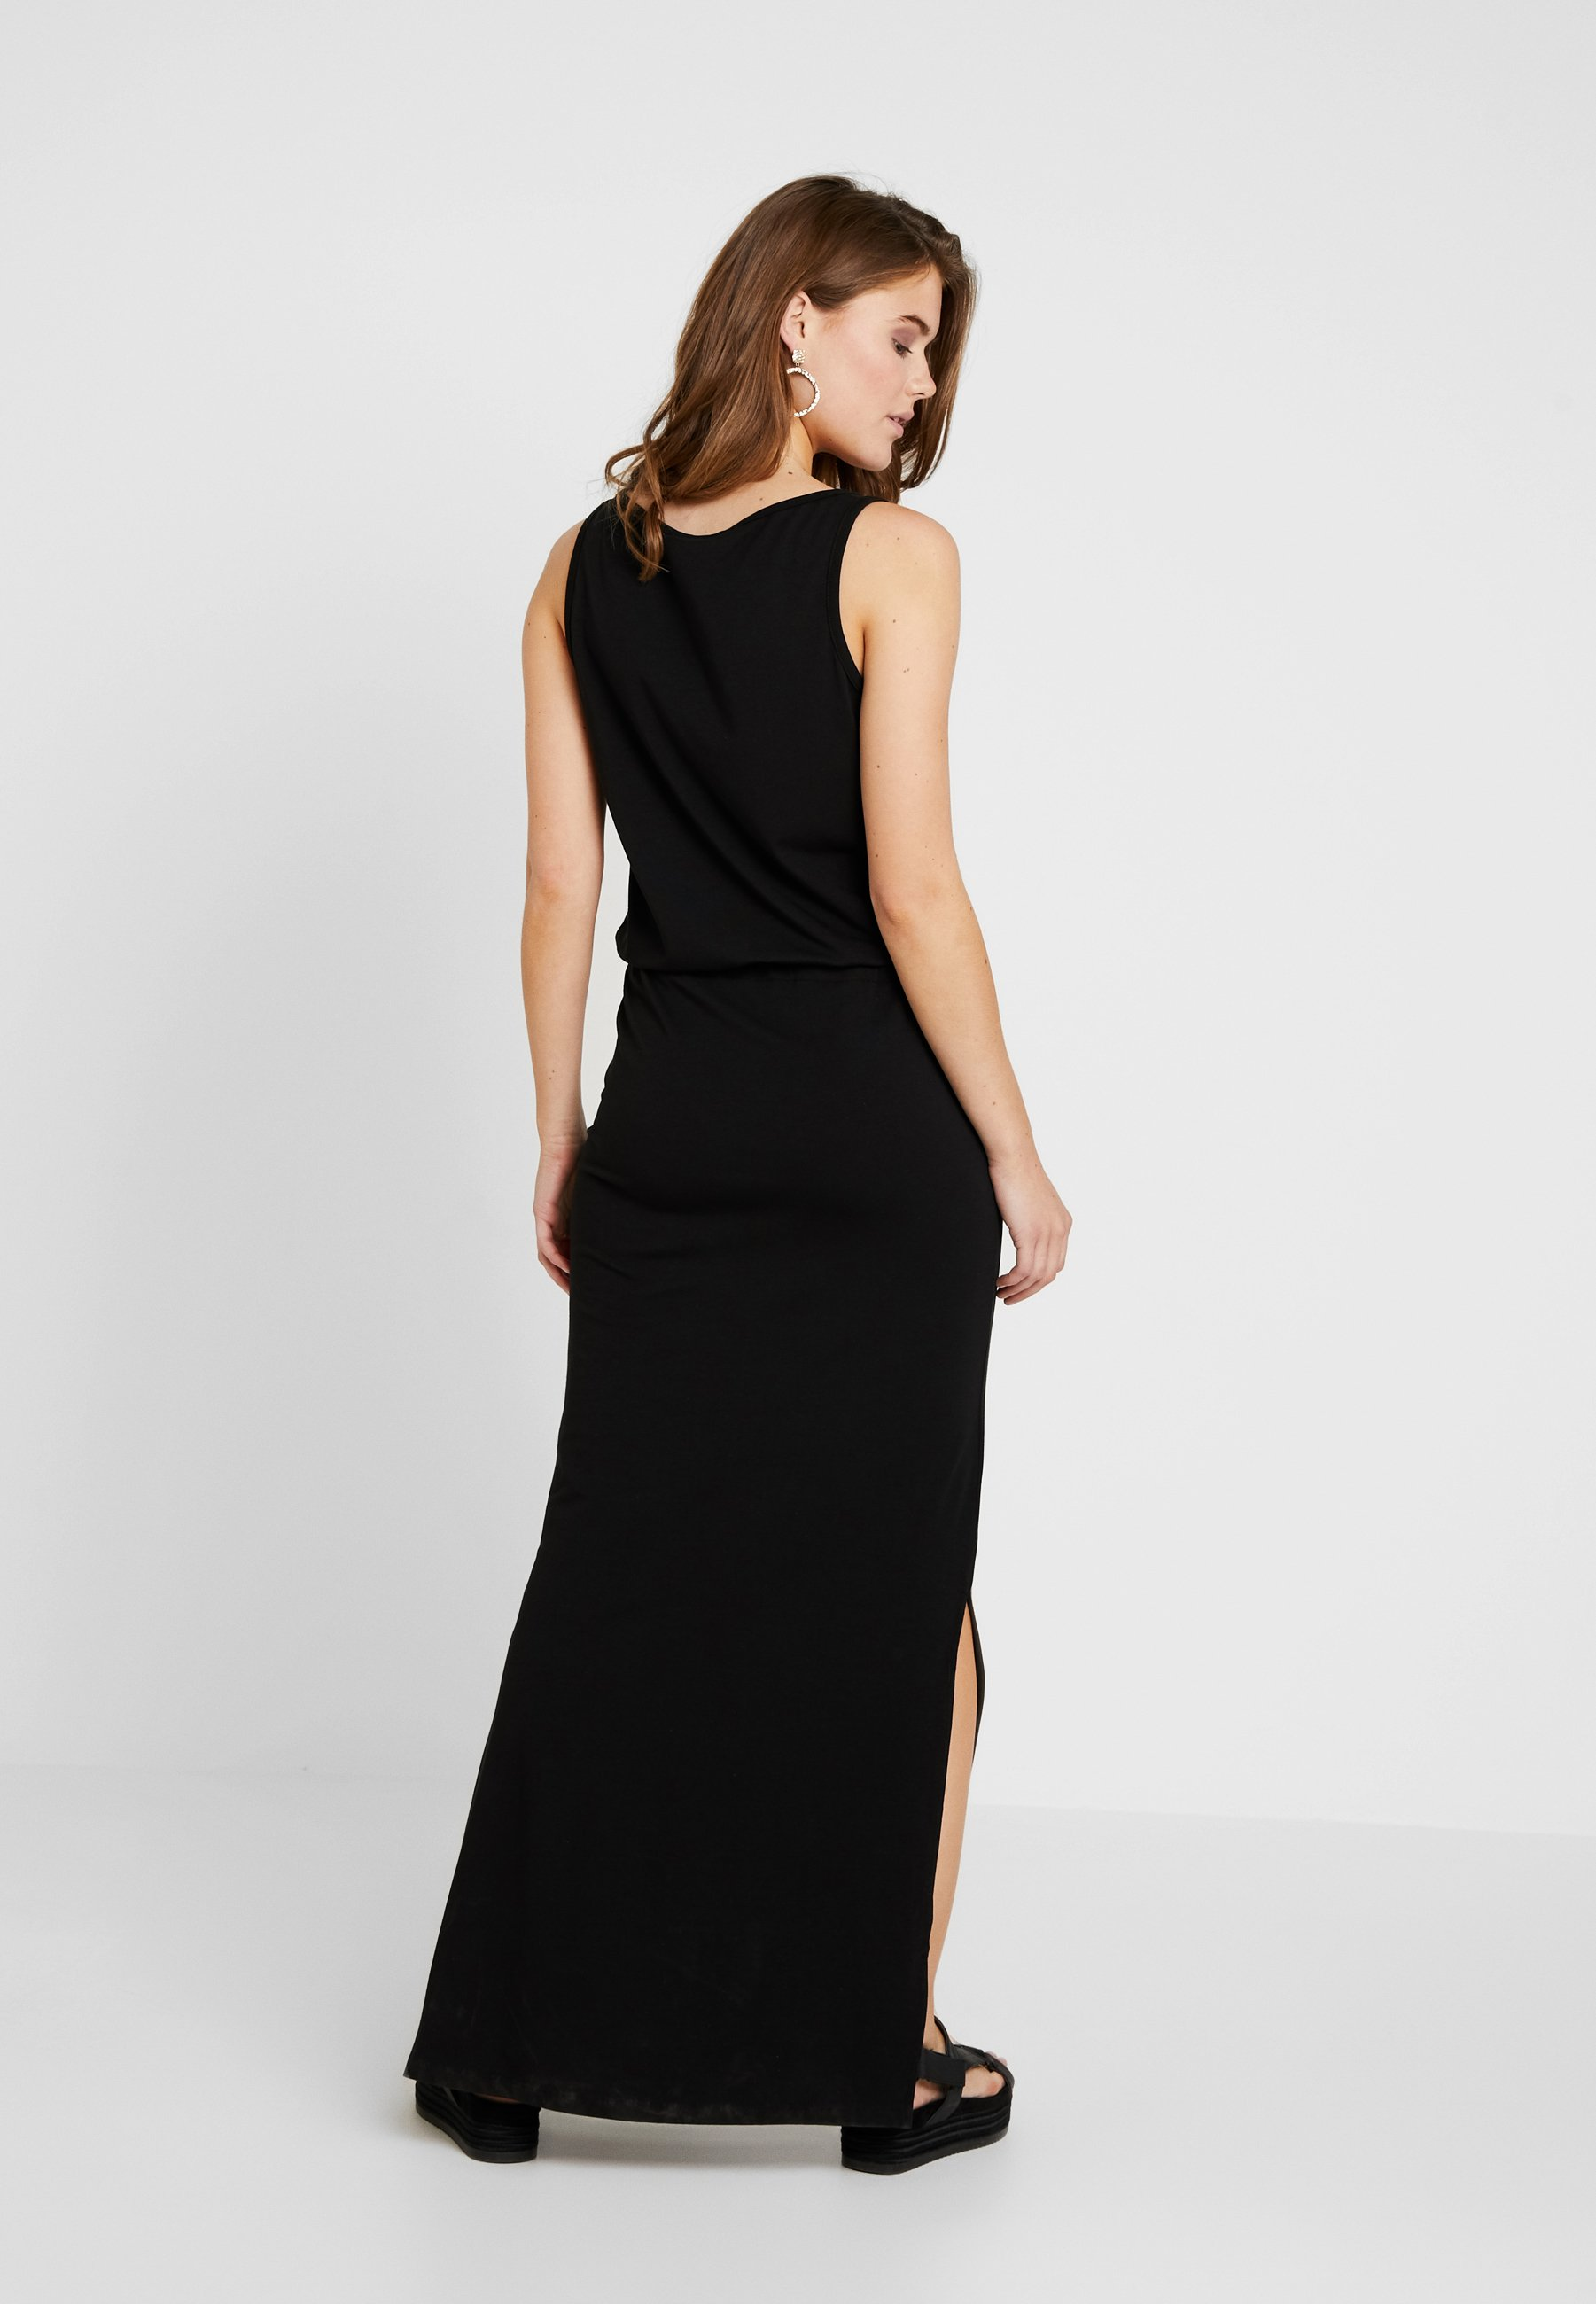 Longue Object DressRobe Black Maxi Objstephanie hdtsQr